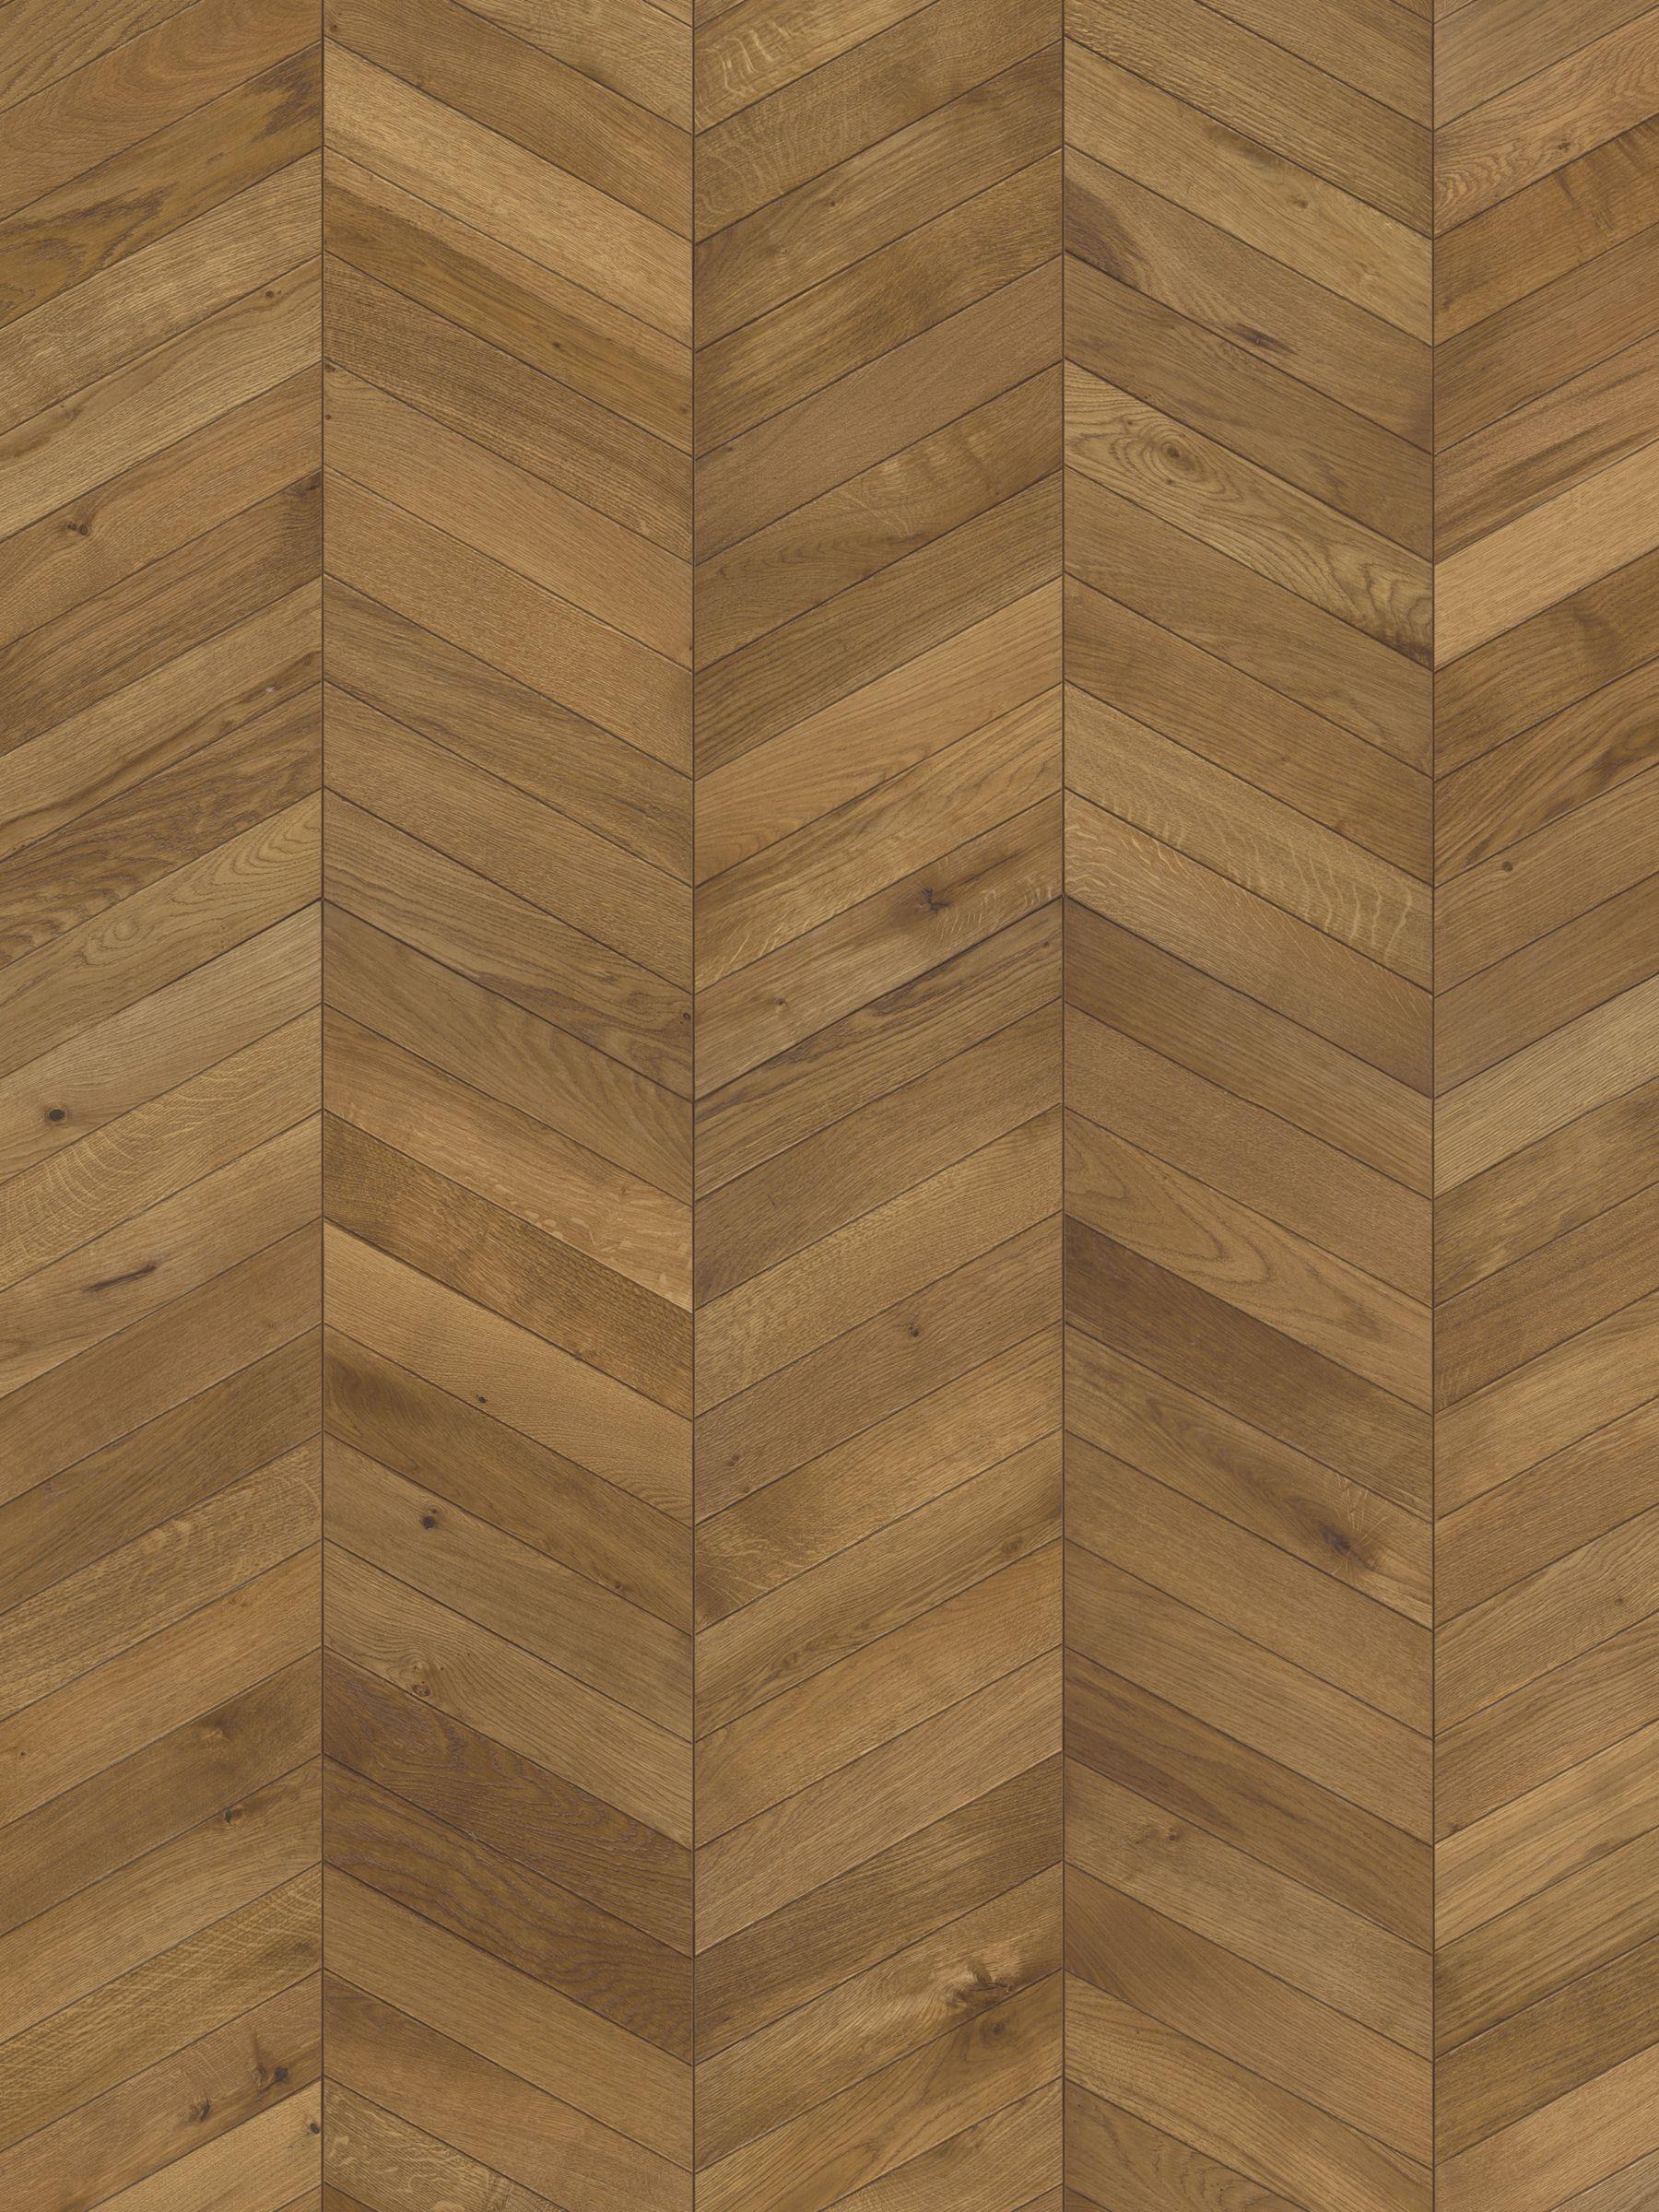 Kahrs Chevron Hard Flooring, Light Brown